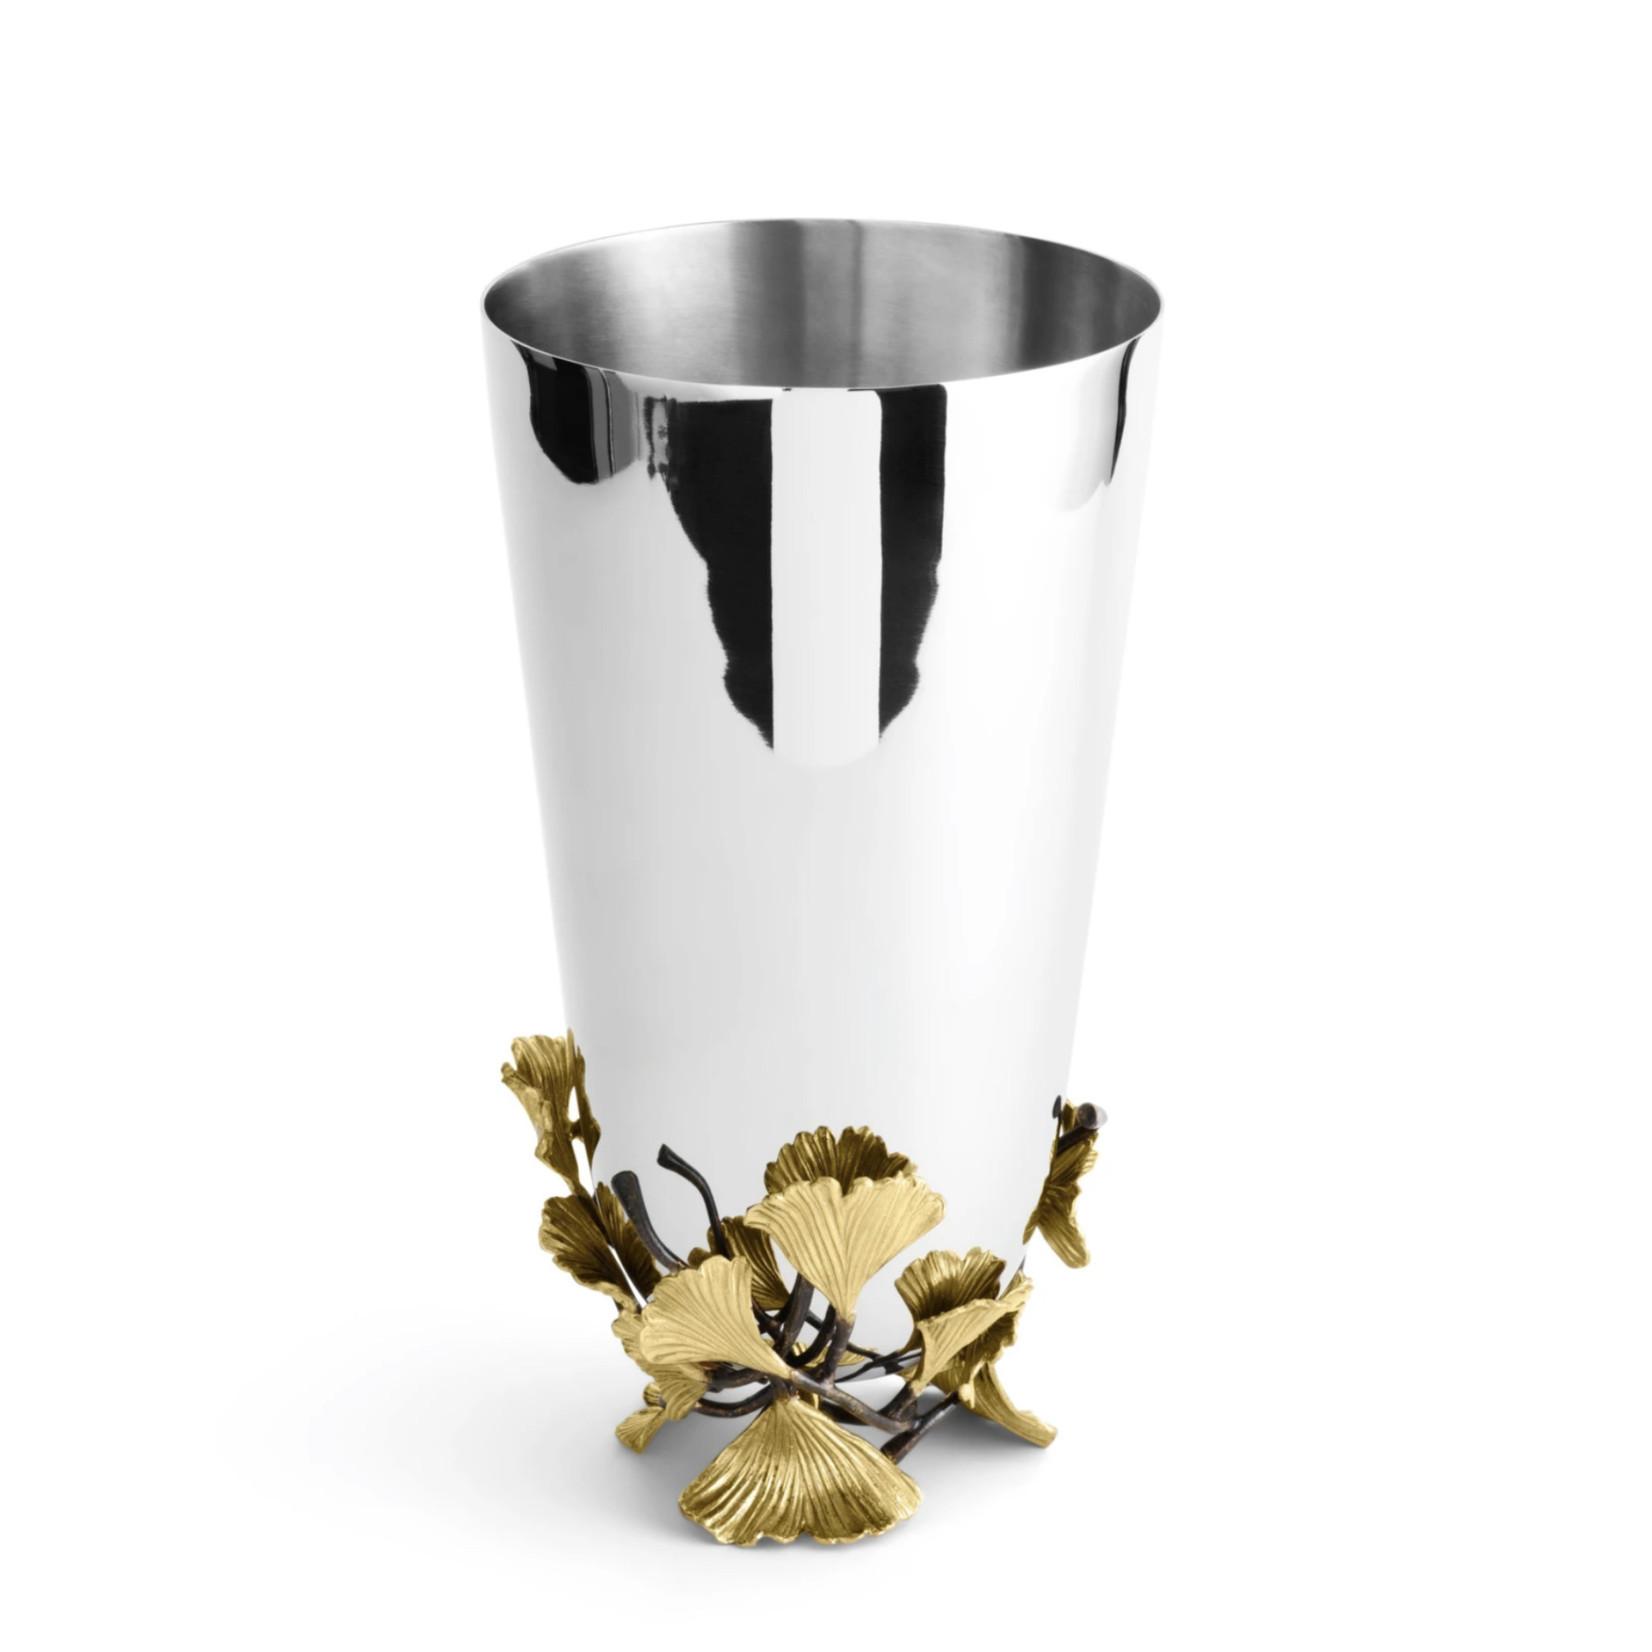 Michael Aram Golden Ginkgo Vase